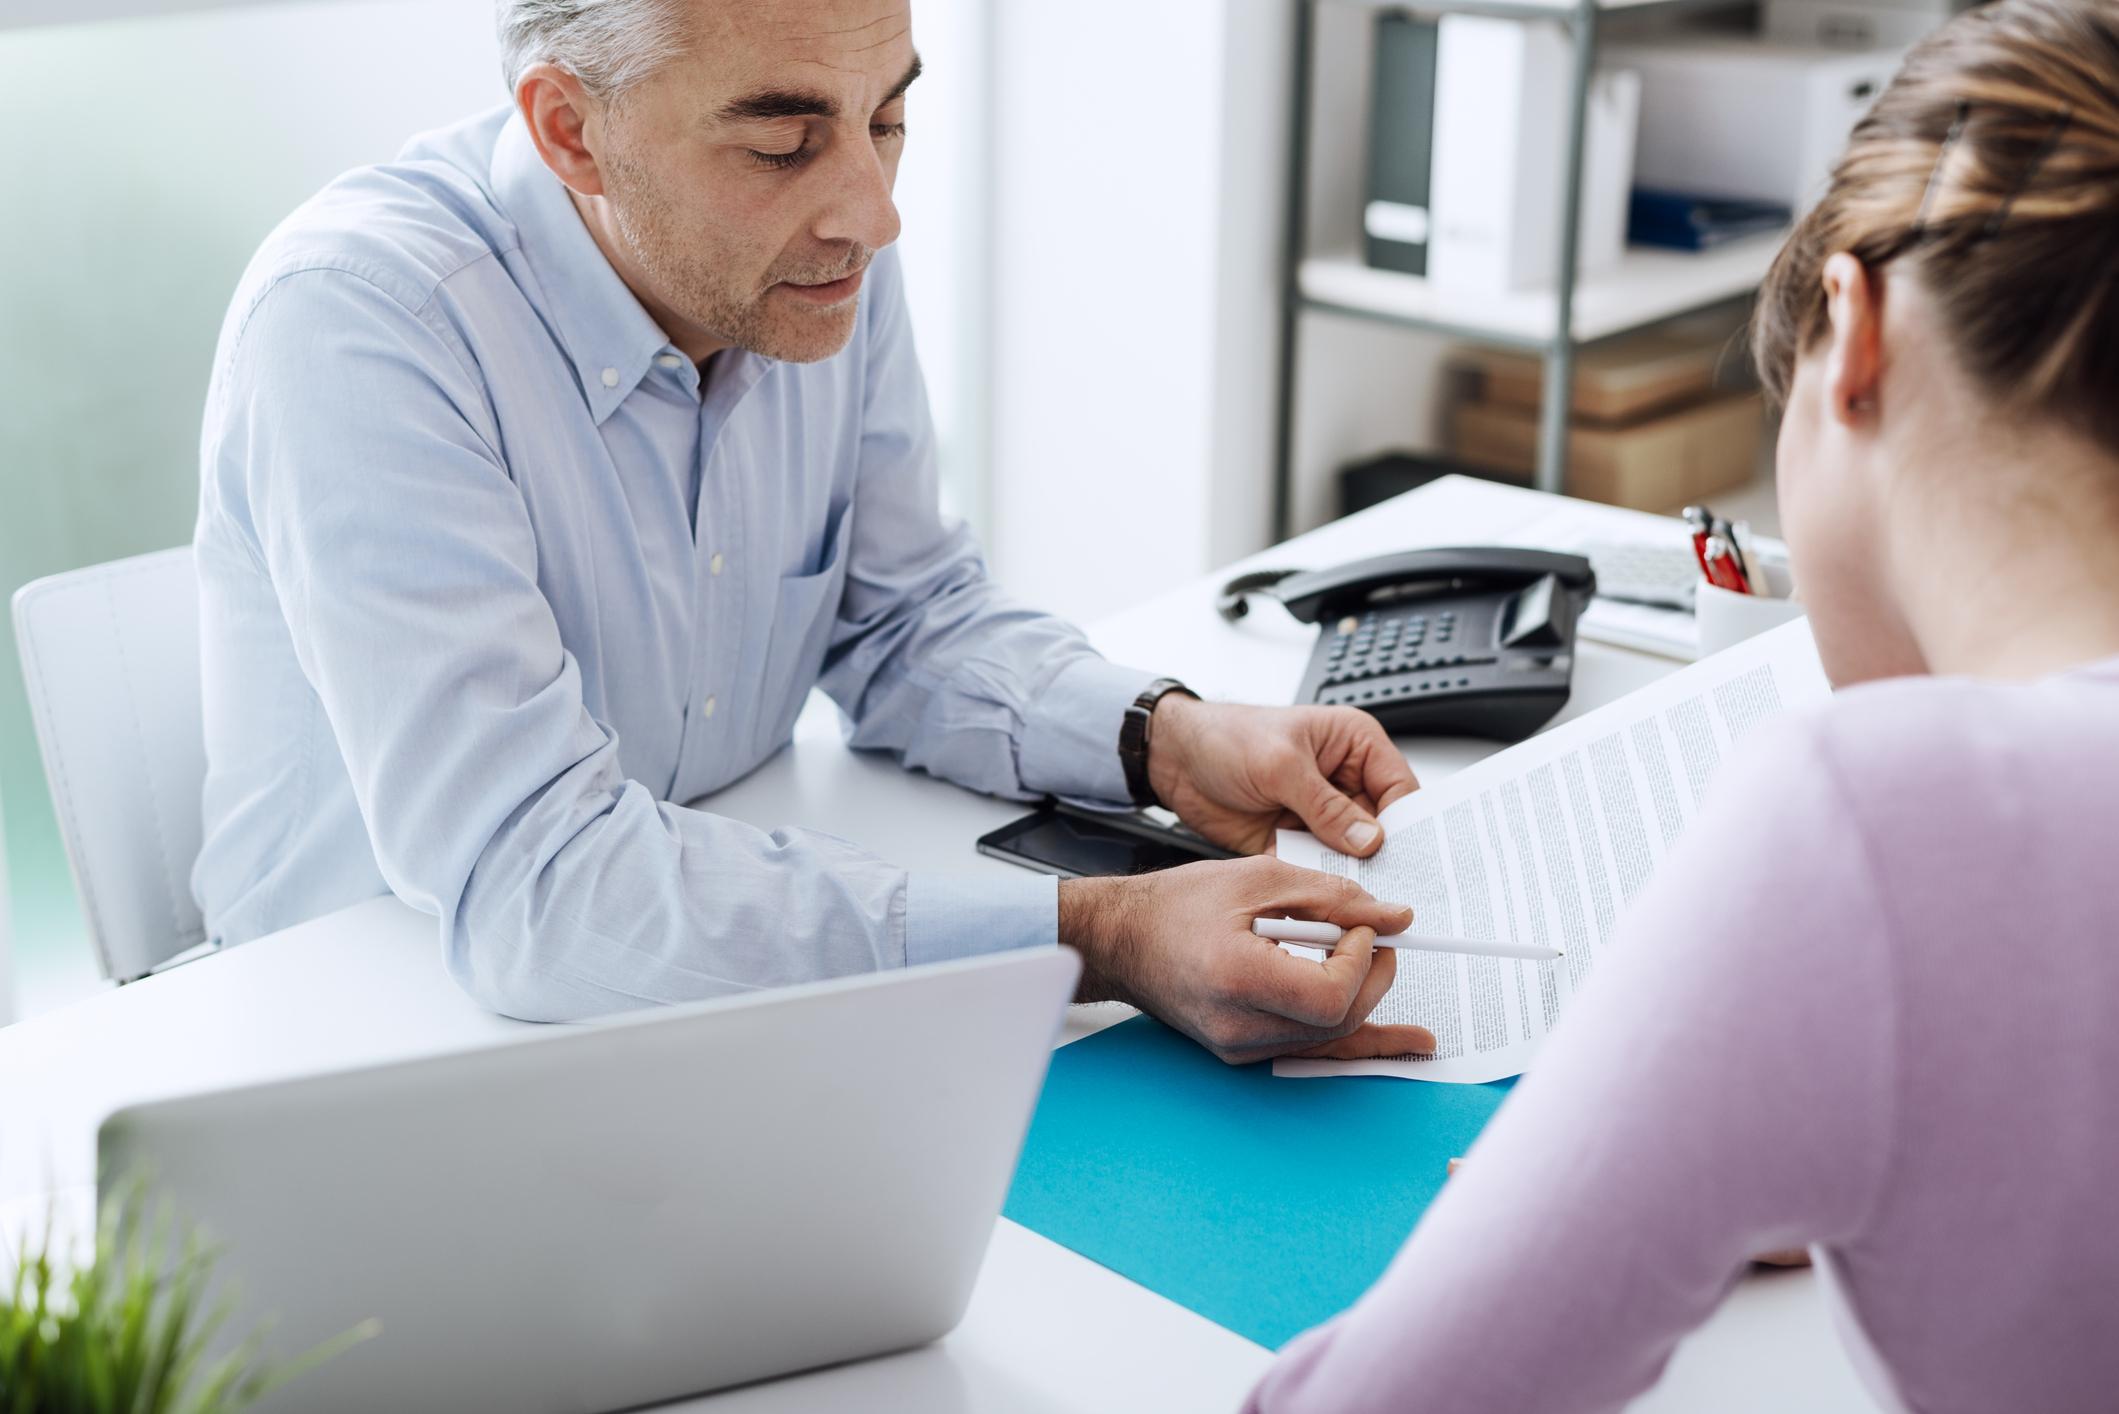 Qualities of HR Professional